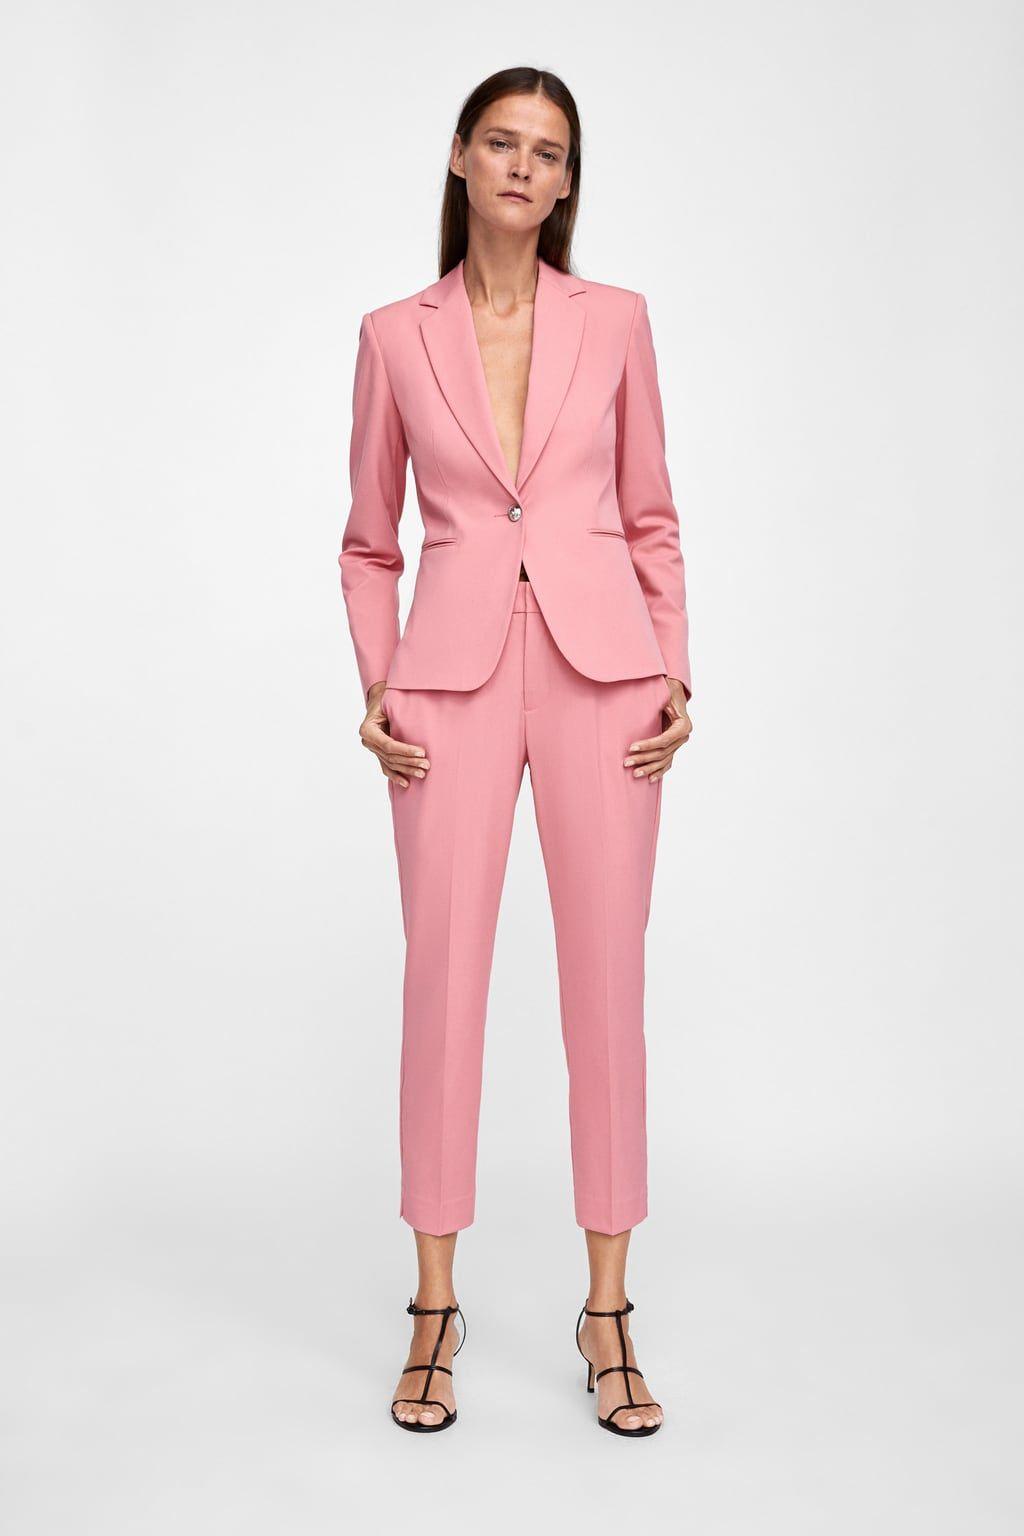 ba89f0c101 Μπλεϊζερ basic | aw18 | Zara suits, Casual suit, Zara fashion